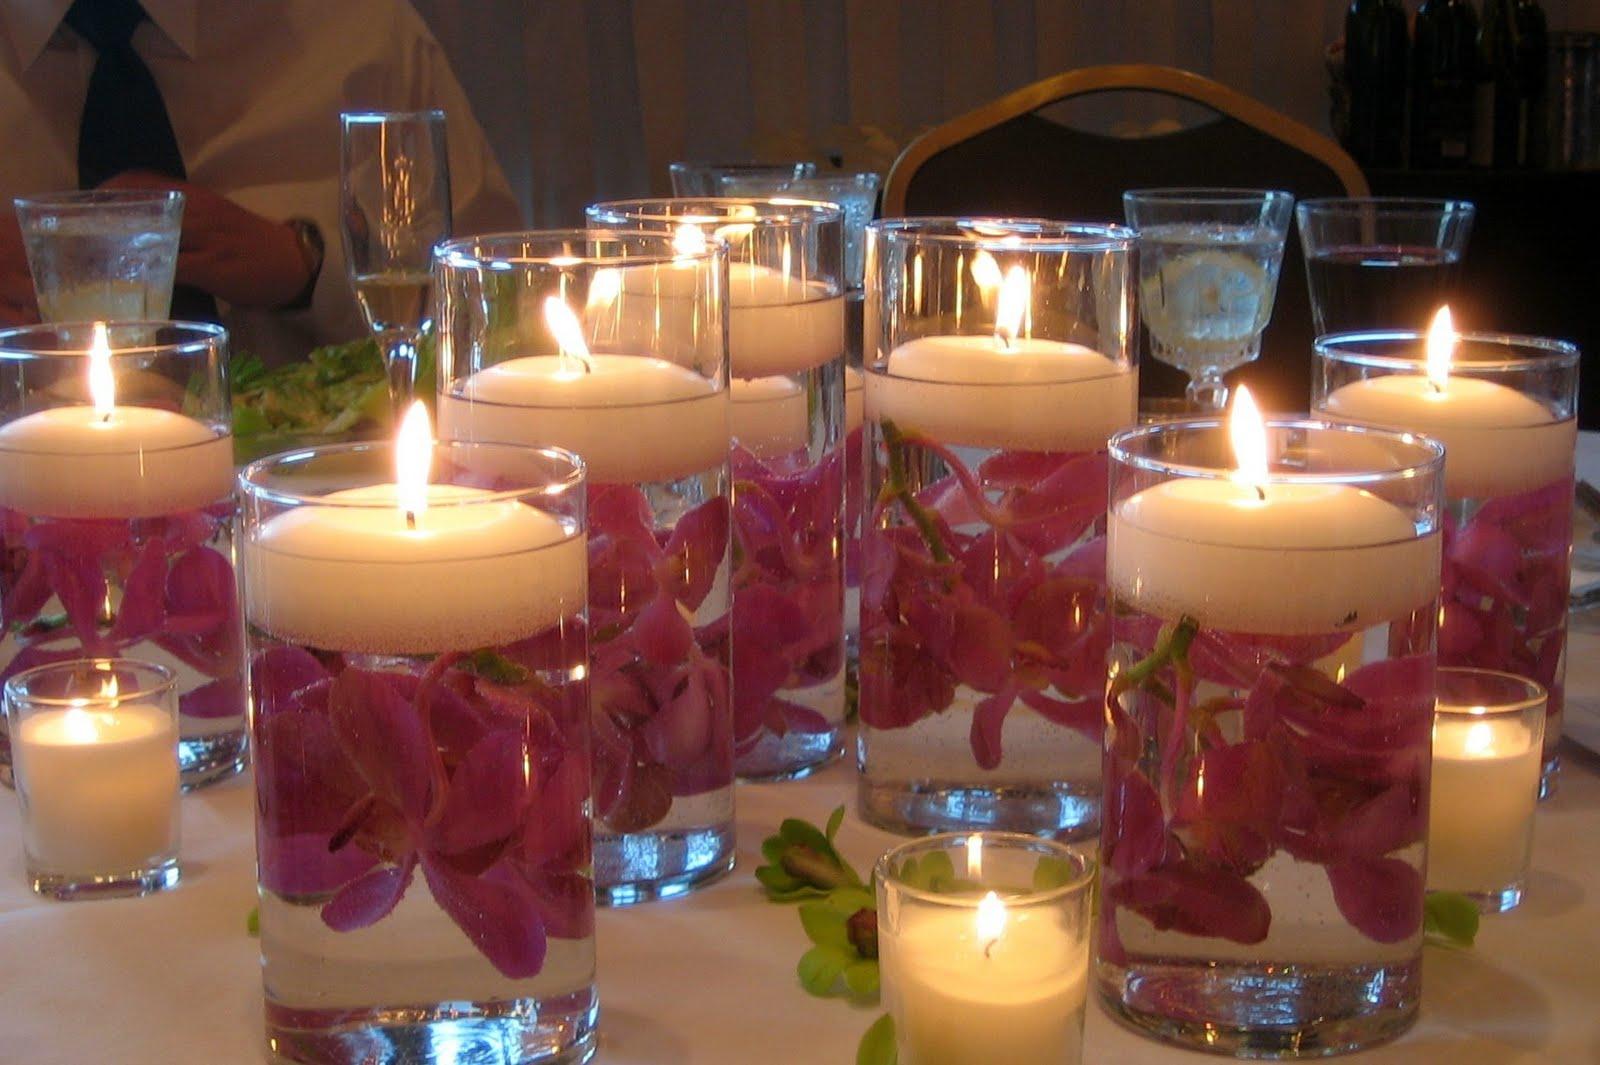 http://2.bp.blogspot.com/_NR-pTkG6FHE/TEGTdlnABDI/AAAAAAAAA30/Bnhe6j073ds/s1600/Floating_wedding_candles.jpg